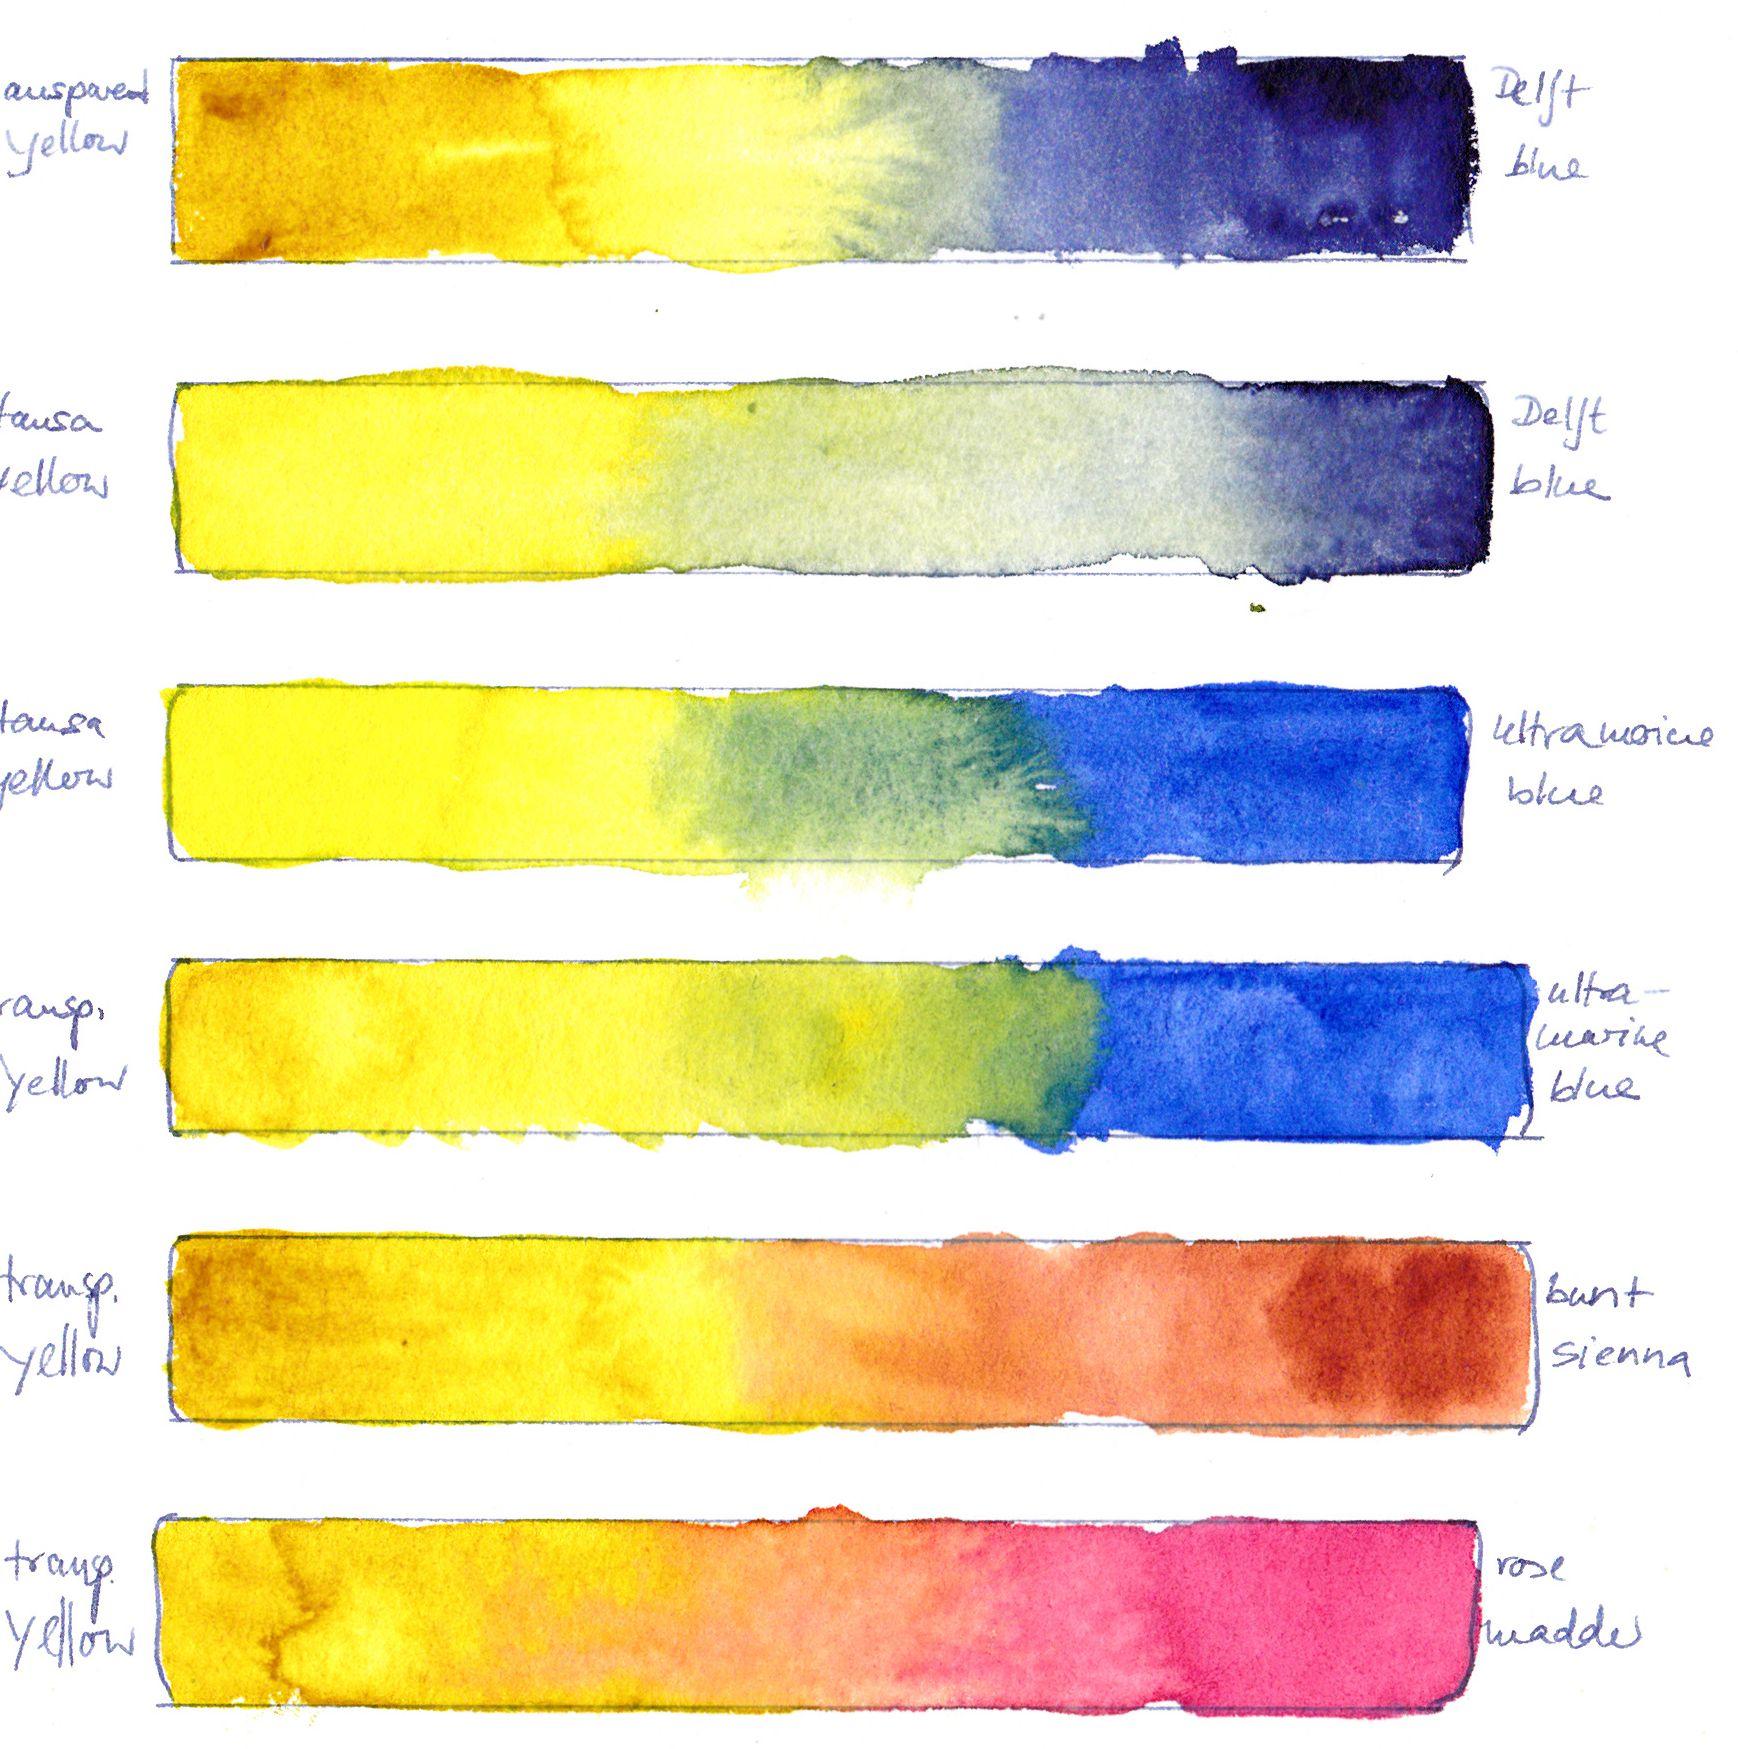 colourchart_1_2